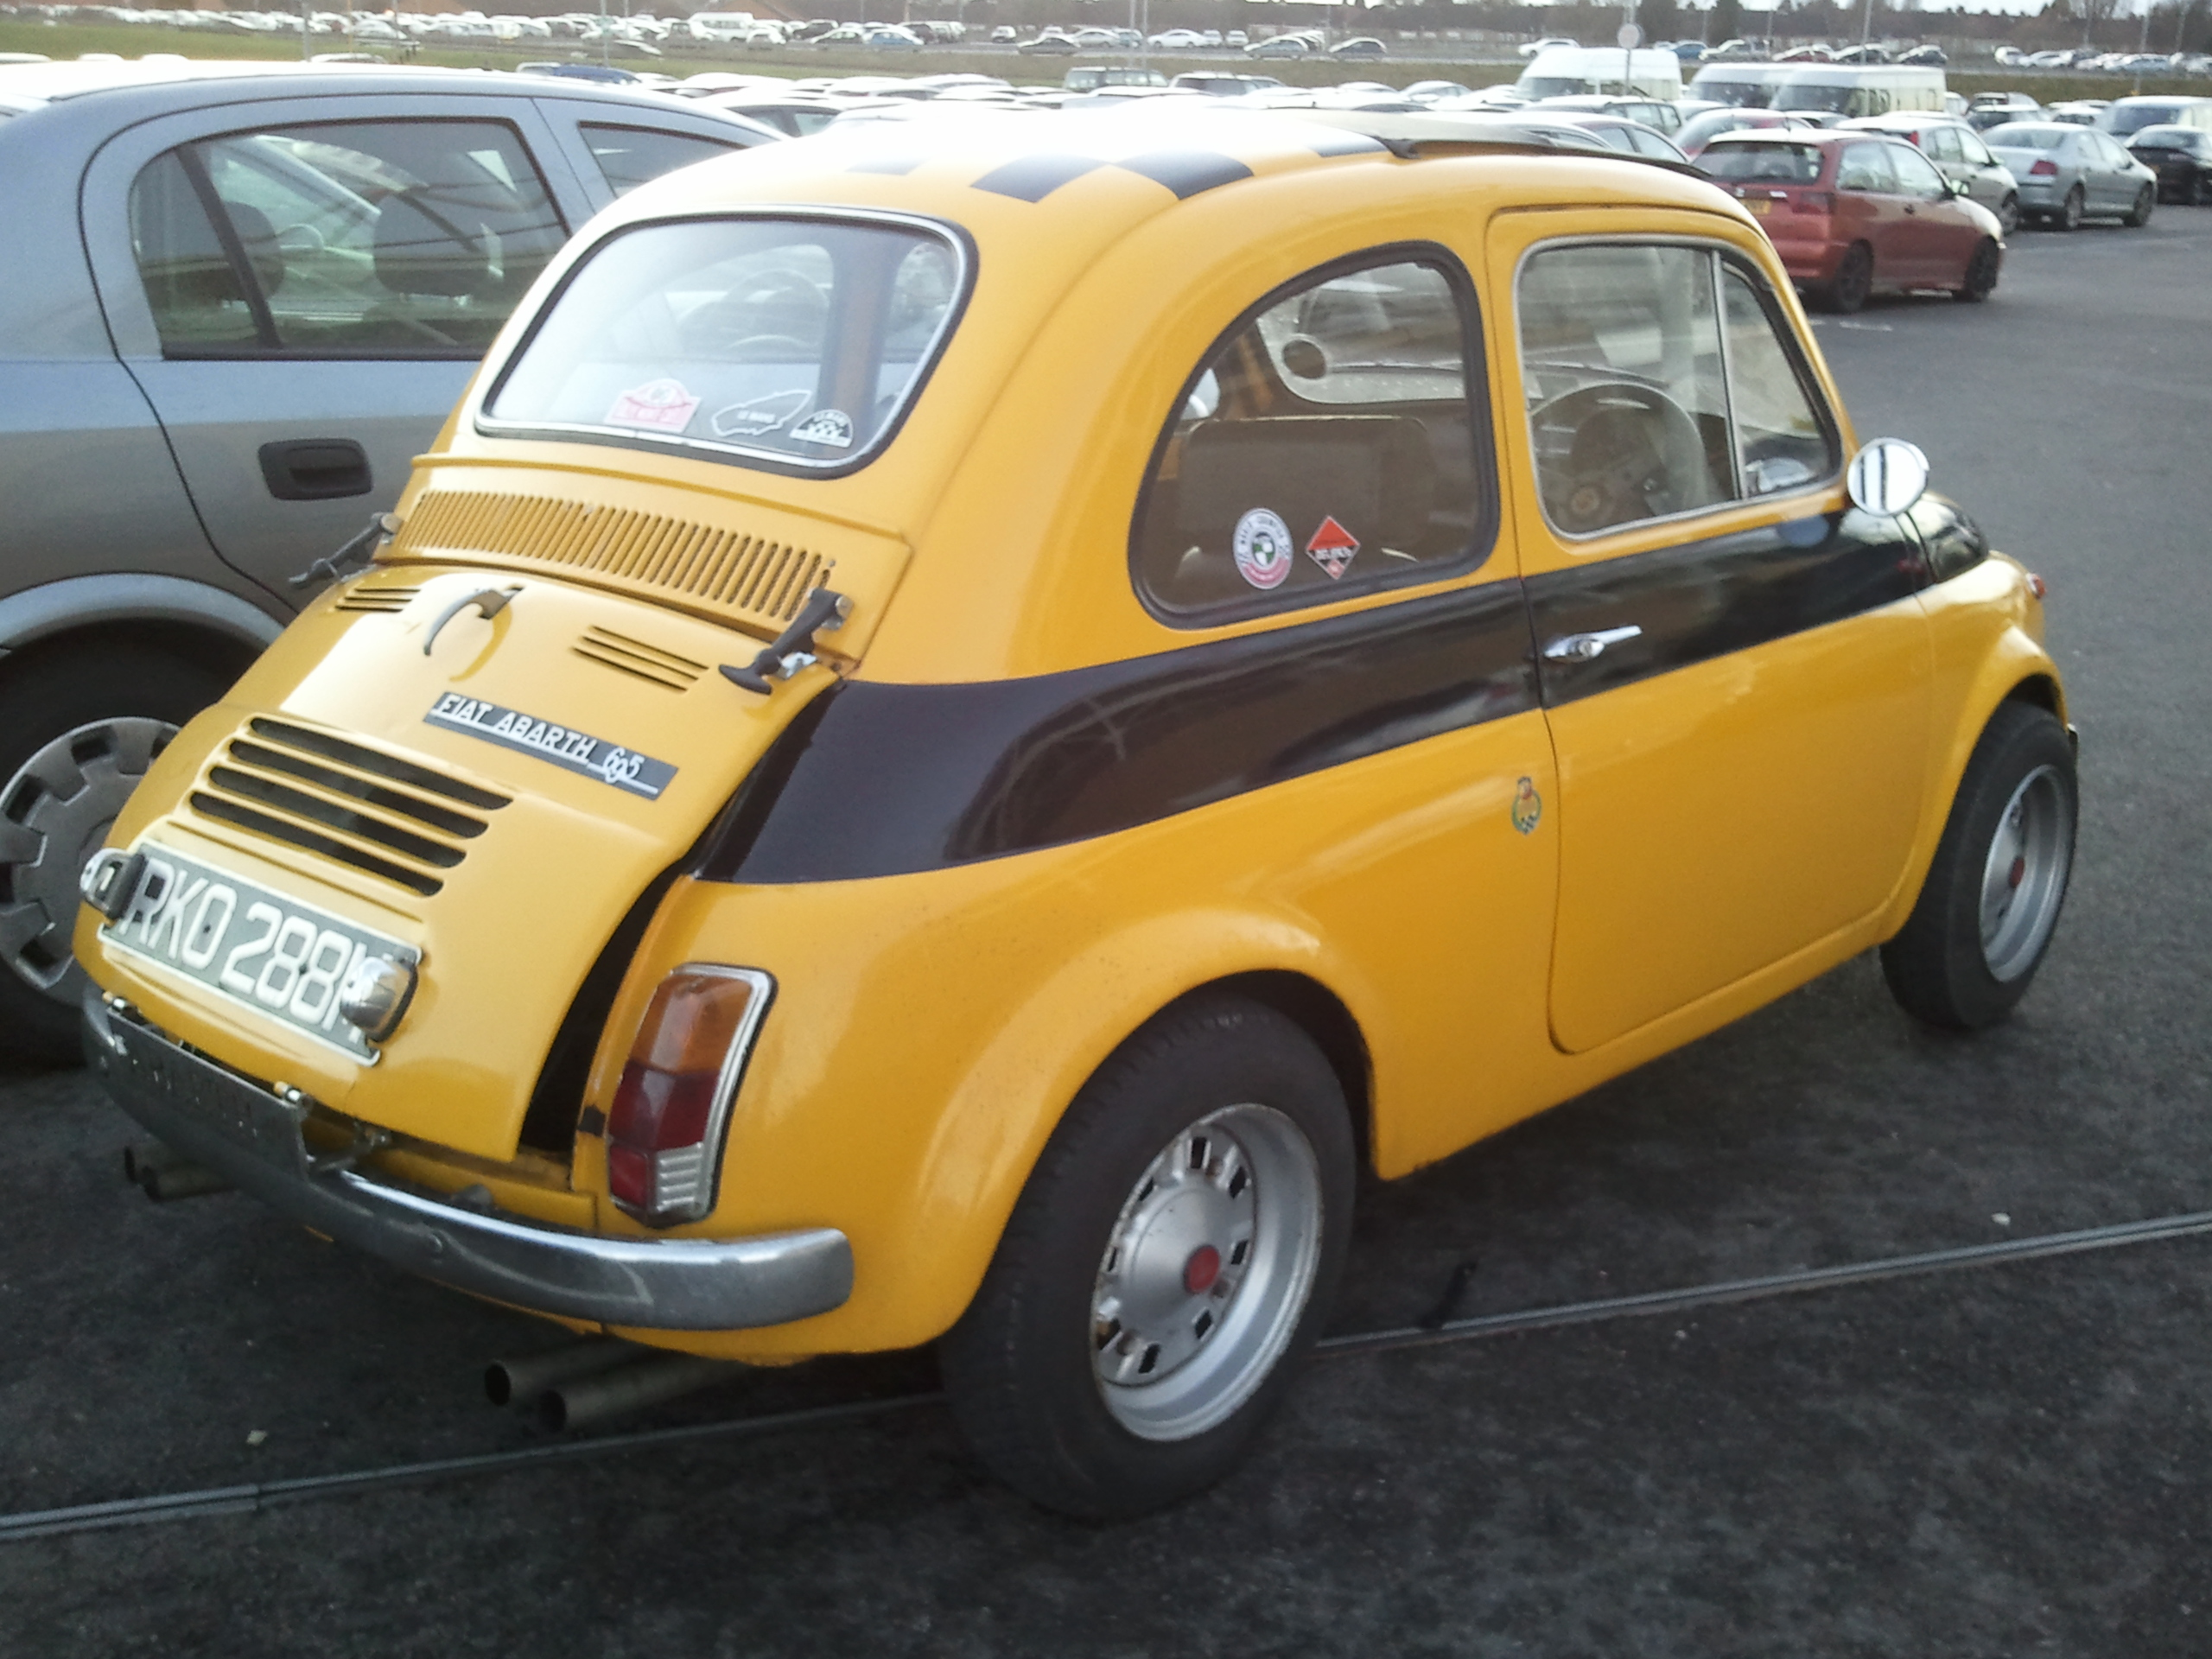 Click image for larger version  Name: <a href='http://www.fiatforum.com/autolink.php?id=1&script=showthread&forumid=39' target='_blank' title='Fabbrica Italiana Automobili Torino' class='gal'>fiat</a> 3.jpg Views:26 Size:1.53 MB ID:91751